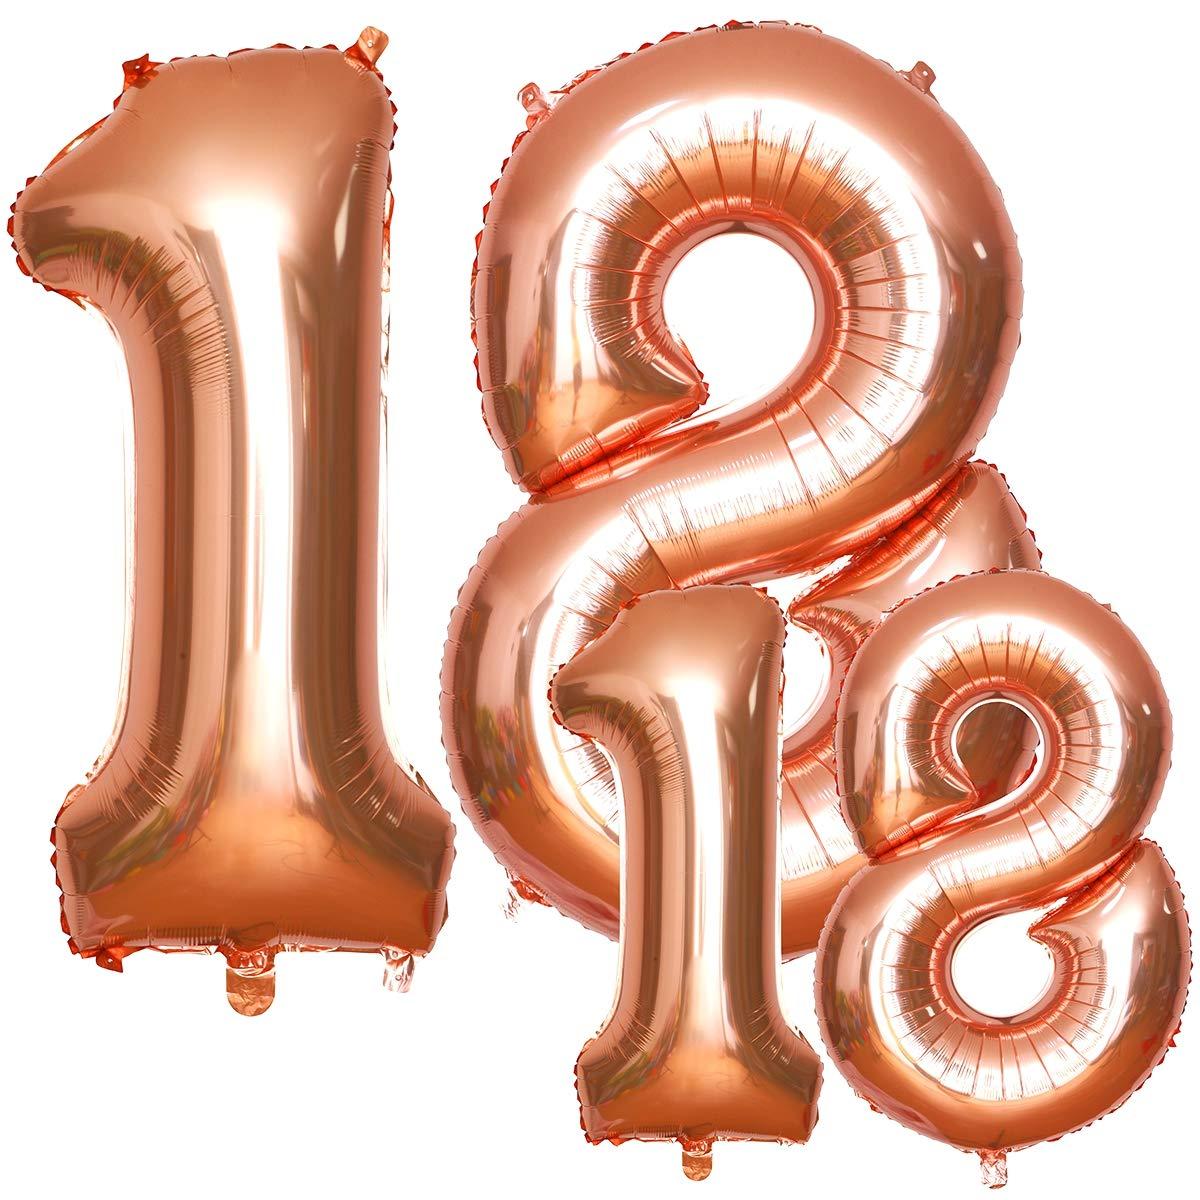 18 Luftballons Zahl Mit Helium Simike Luftballon 18 Geburtstag In 2